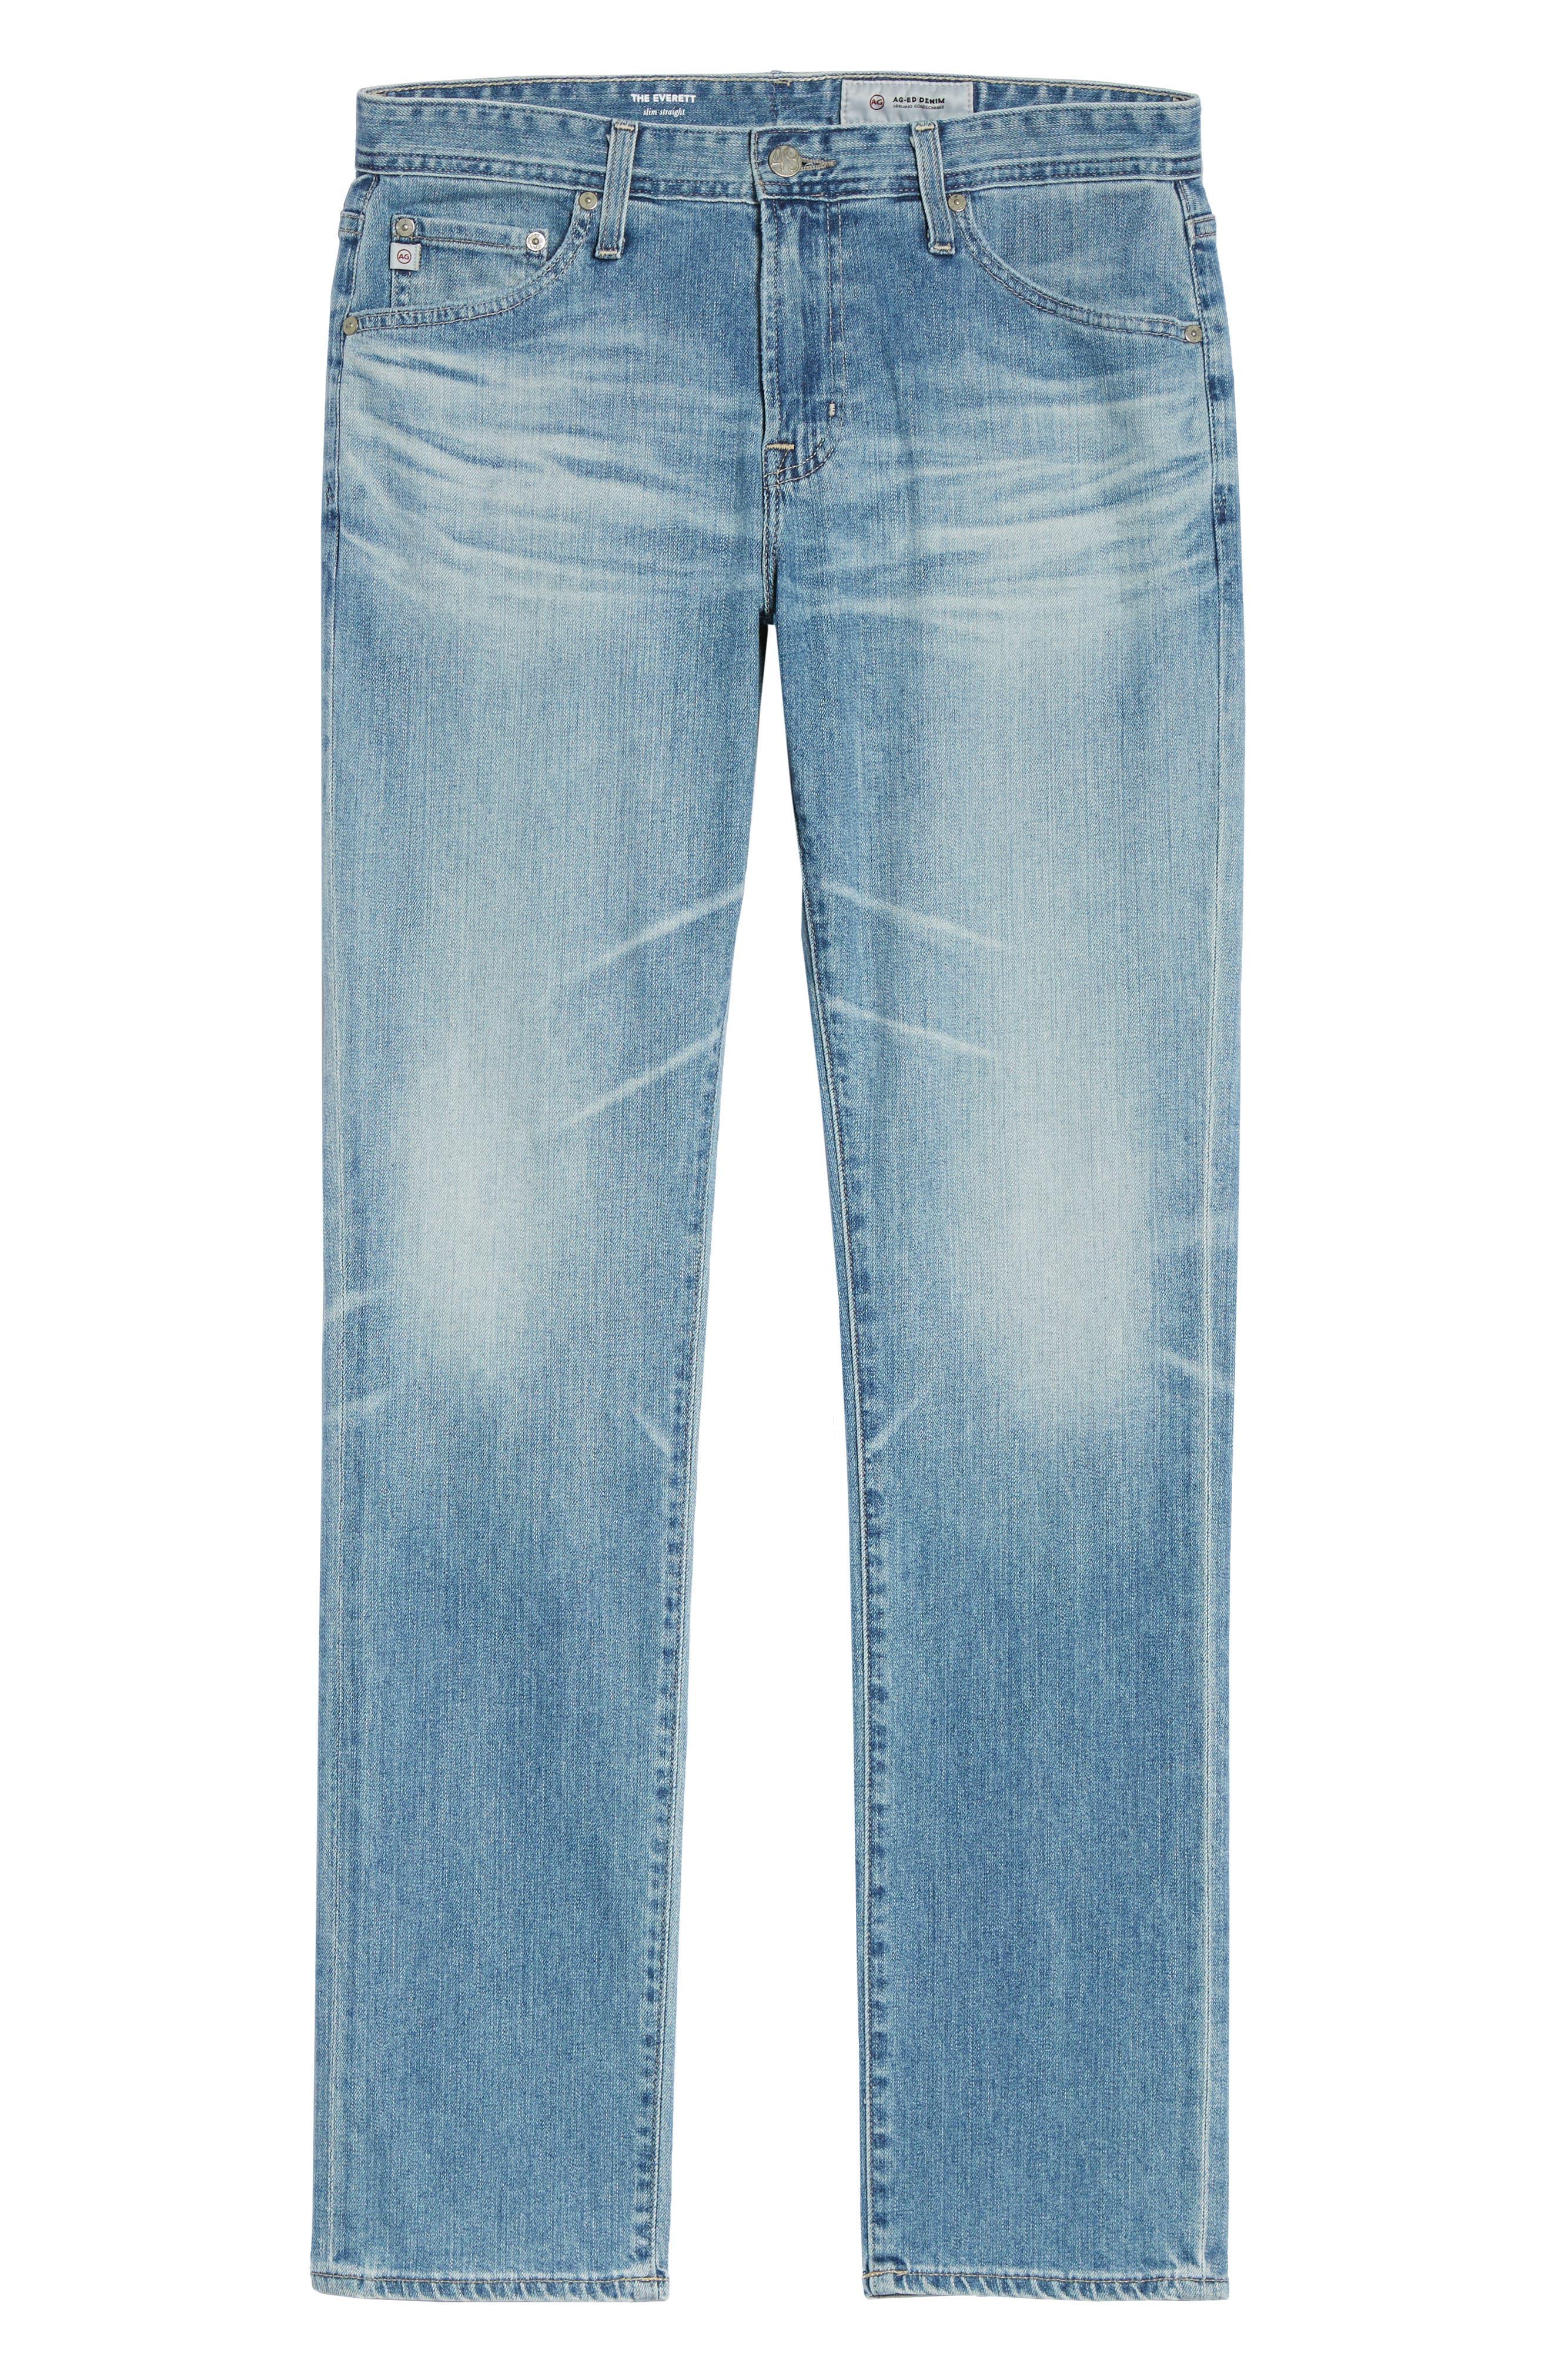 Everett Slim Straight Fit Jeans,                             Alternate thumbnail 6, color,                             18 Years Oceano